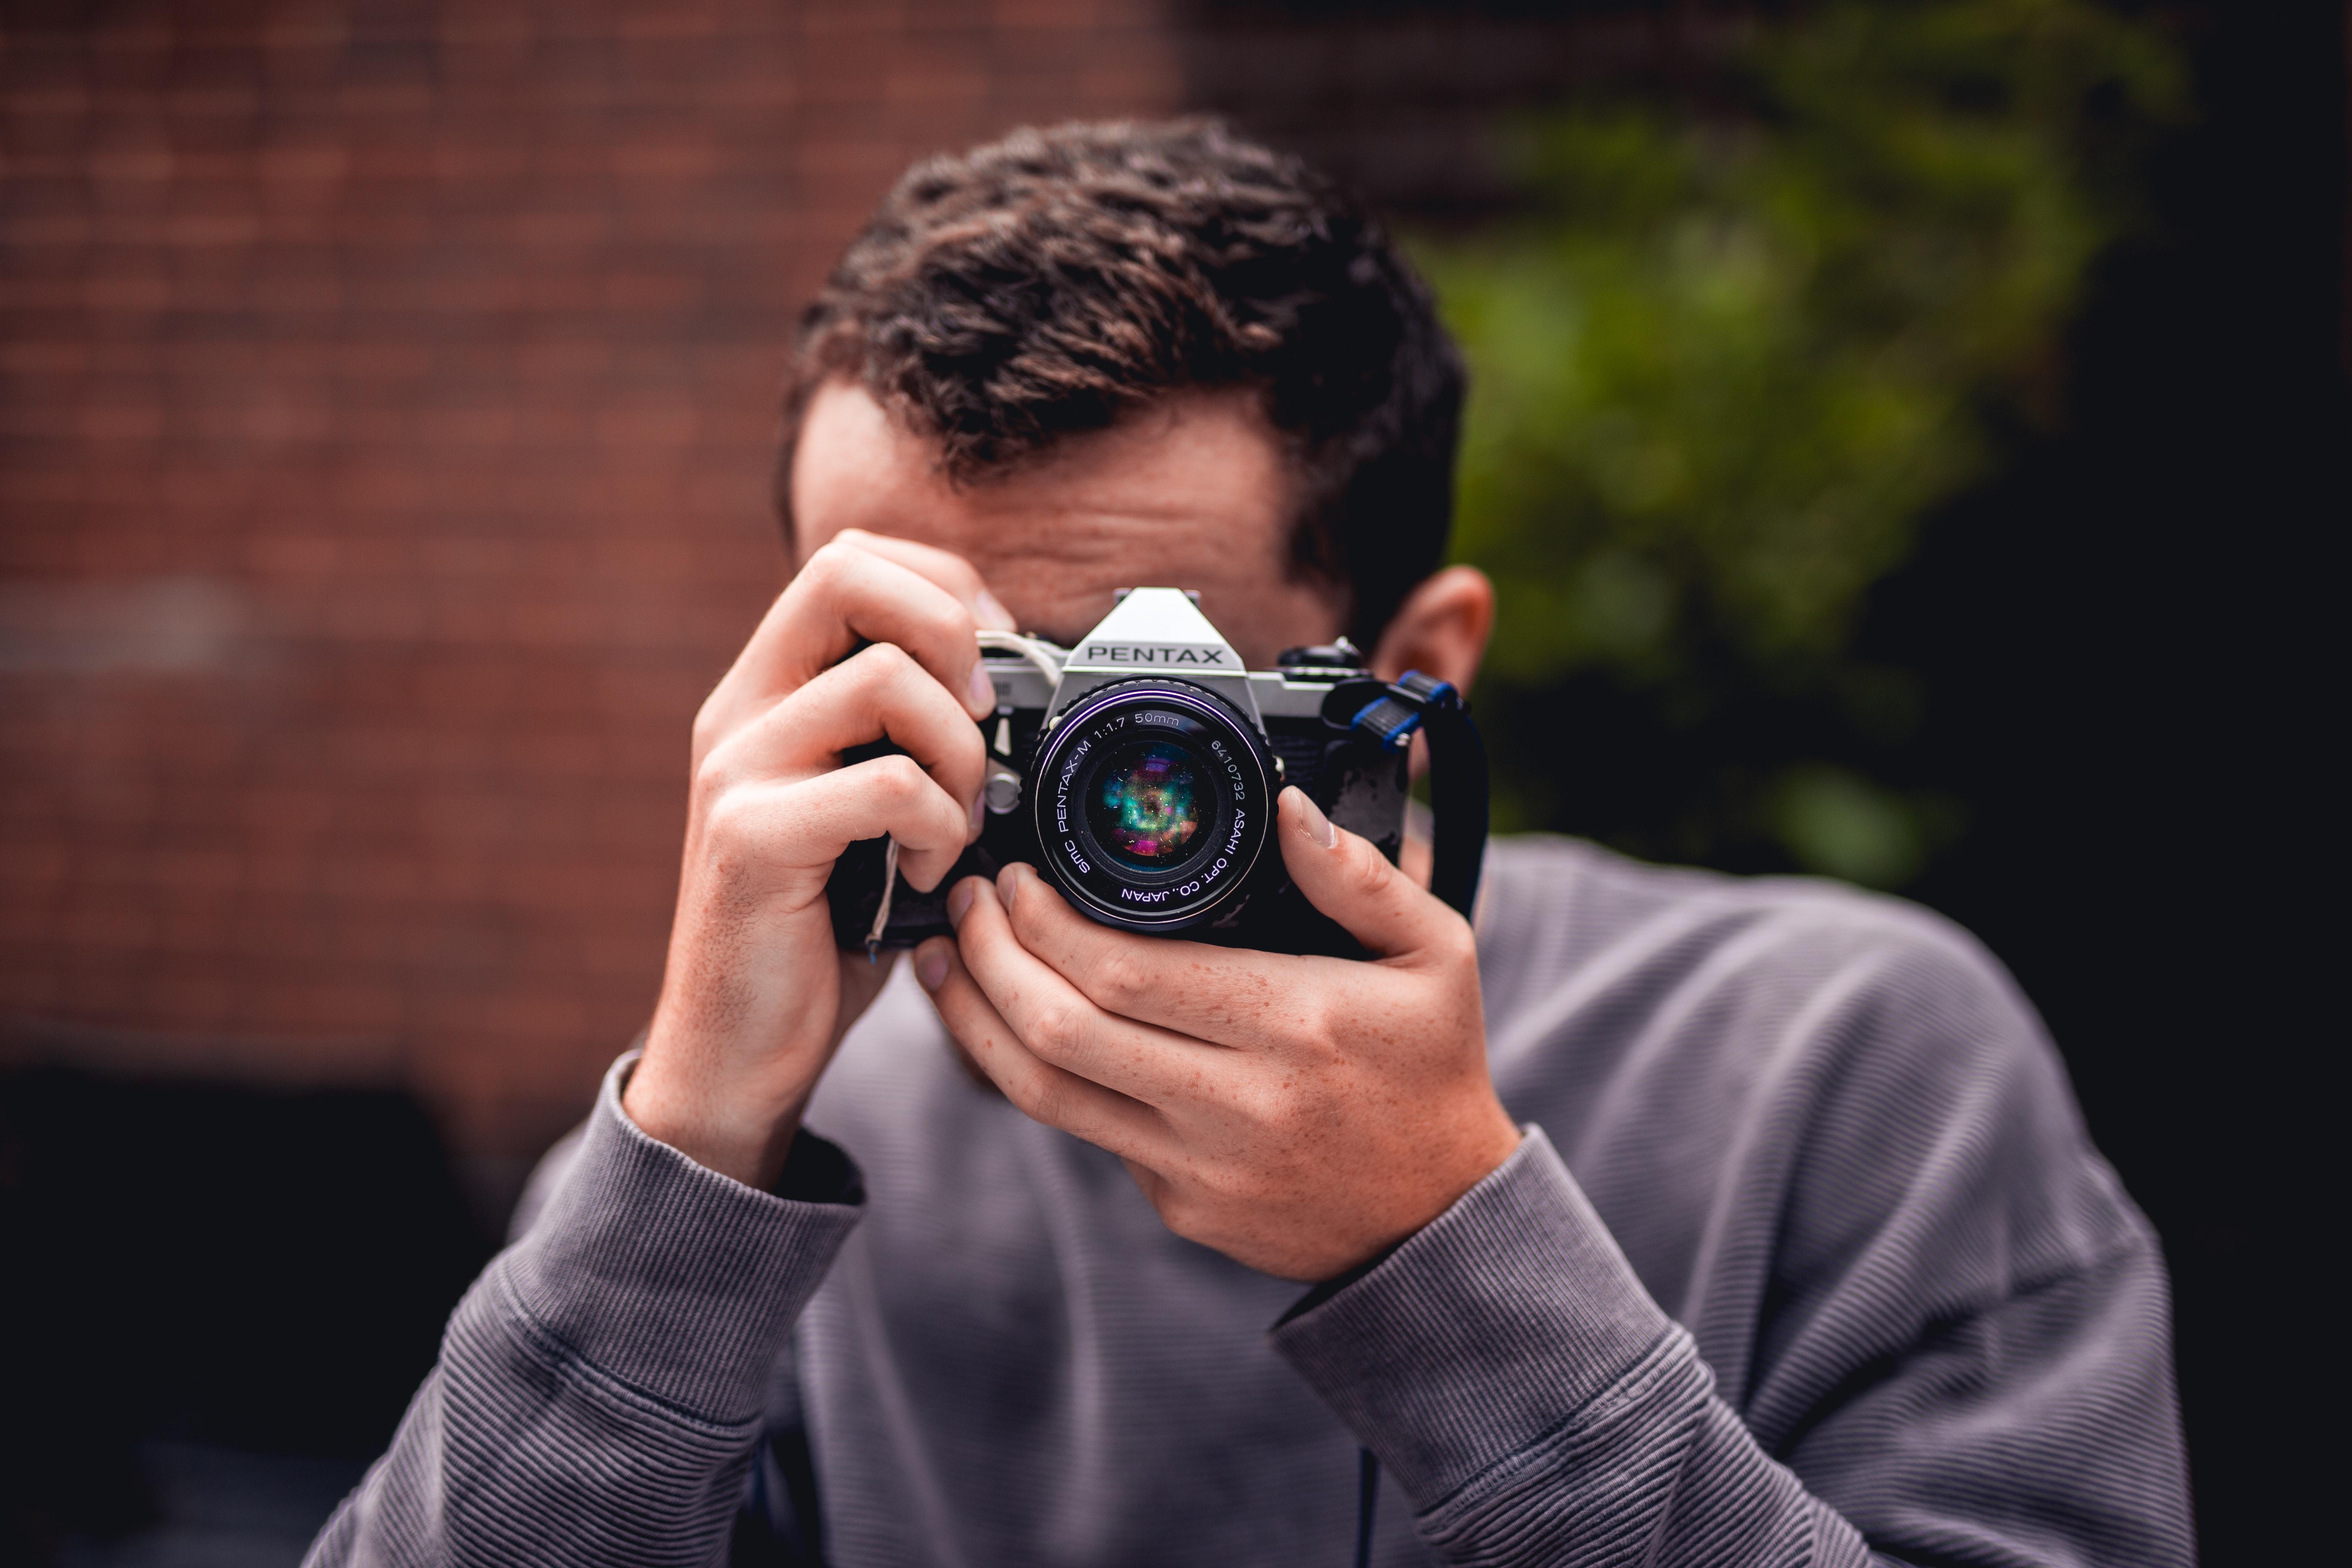 person taking photo using Pentax DSLR camera